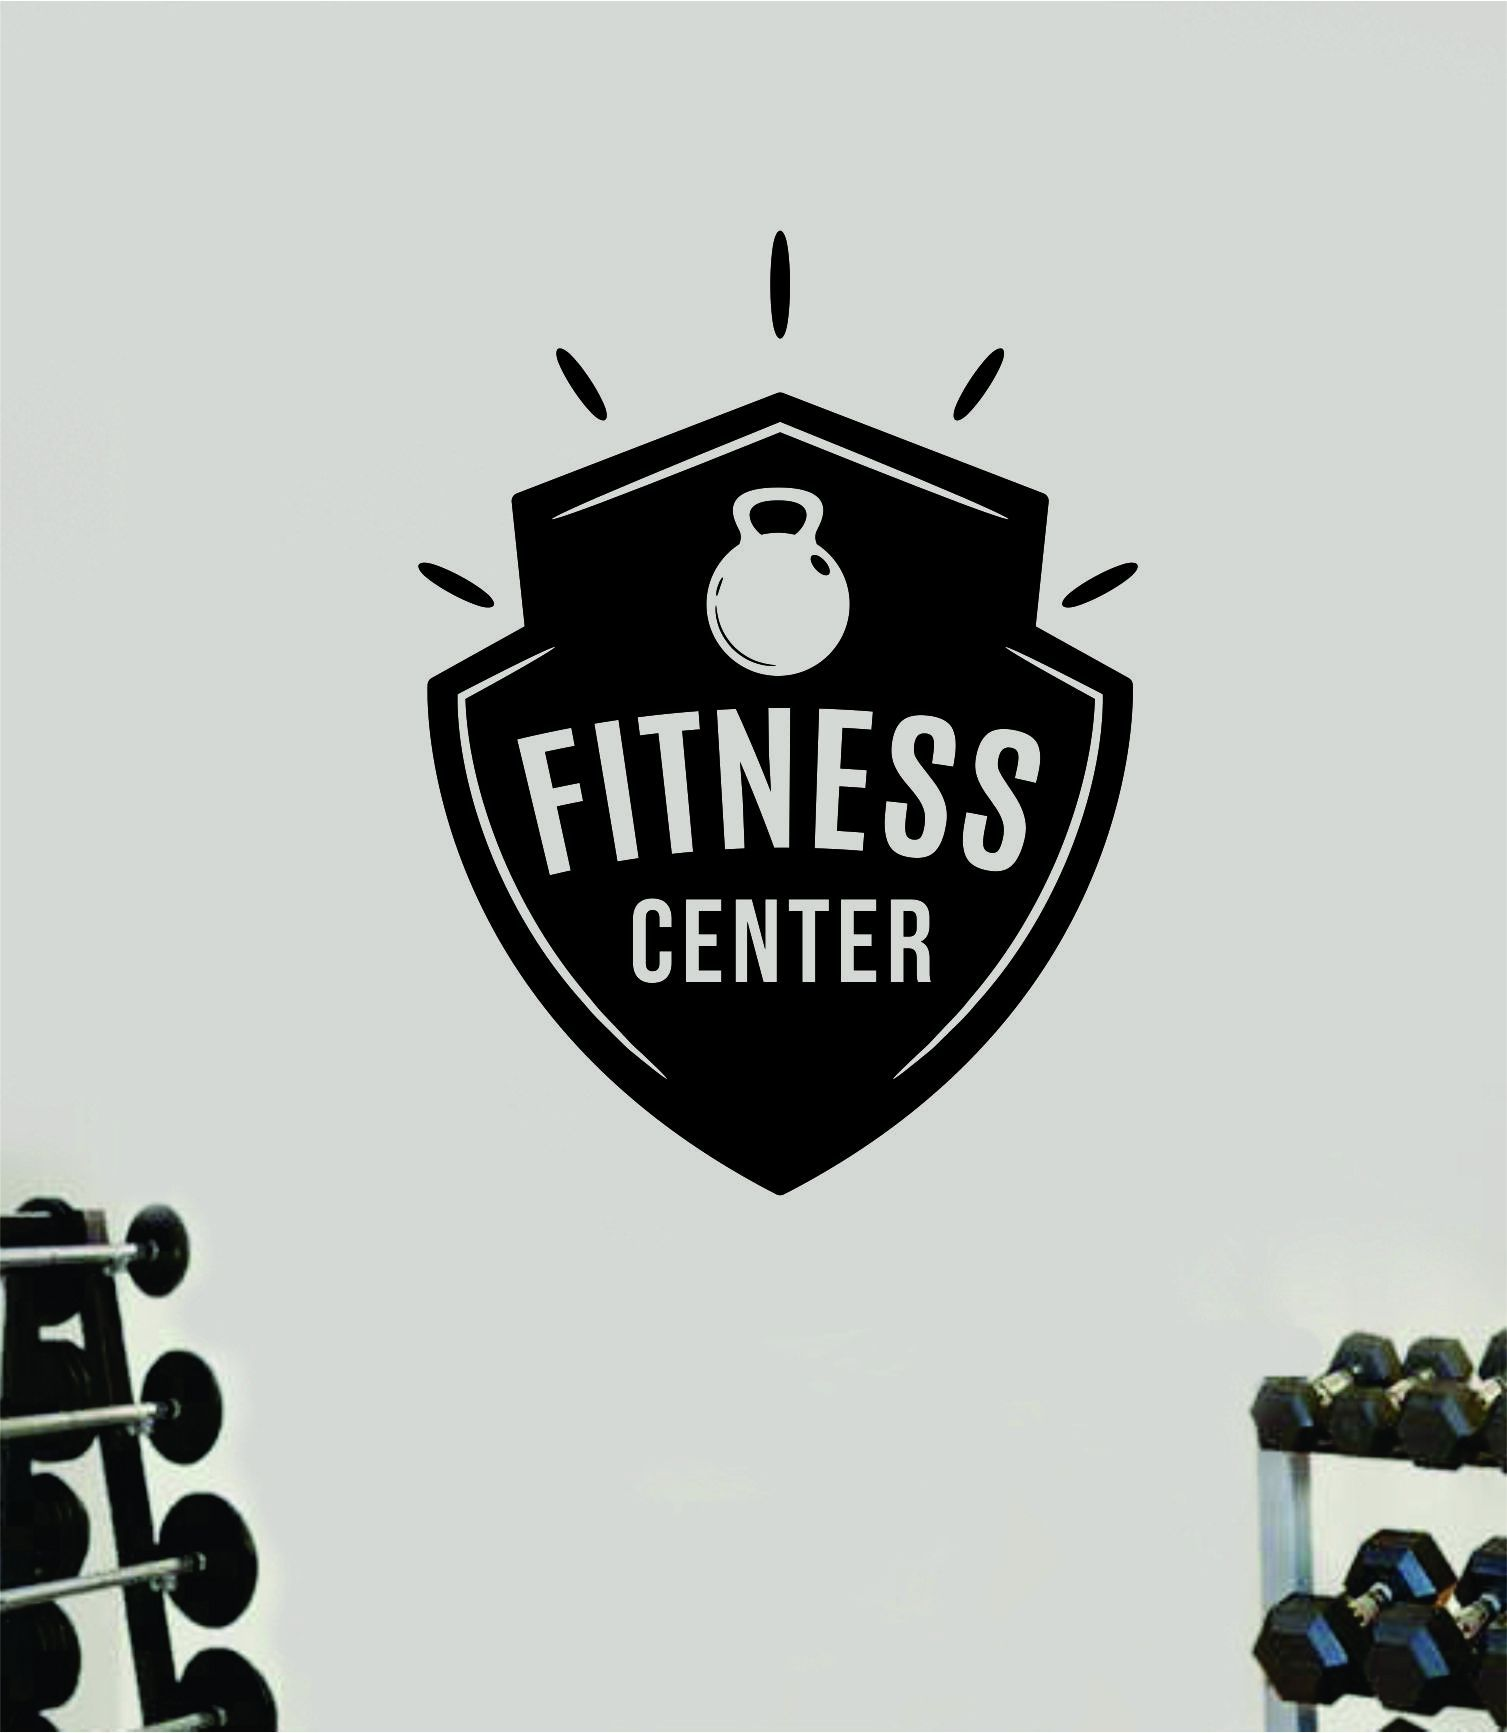 Fitness Center V7 Decal Sticker Wall Vinyl Art Wall Bedroom Room Decor Motivational Inspirational Teen Sports Gym Work Out Lift Health School - purple